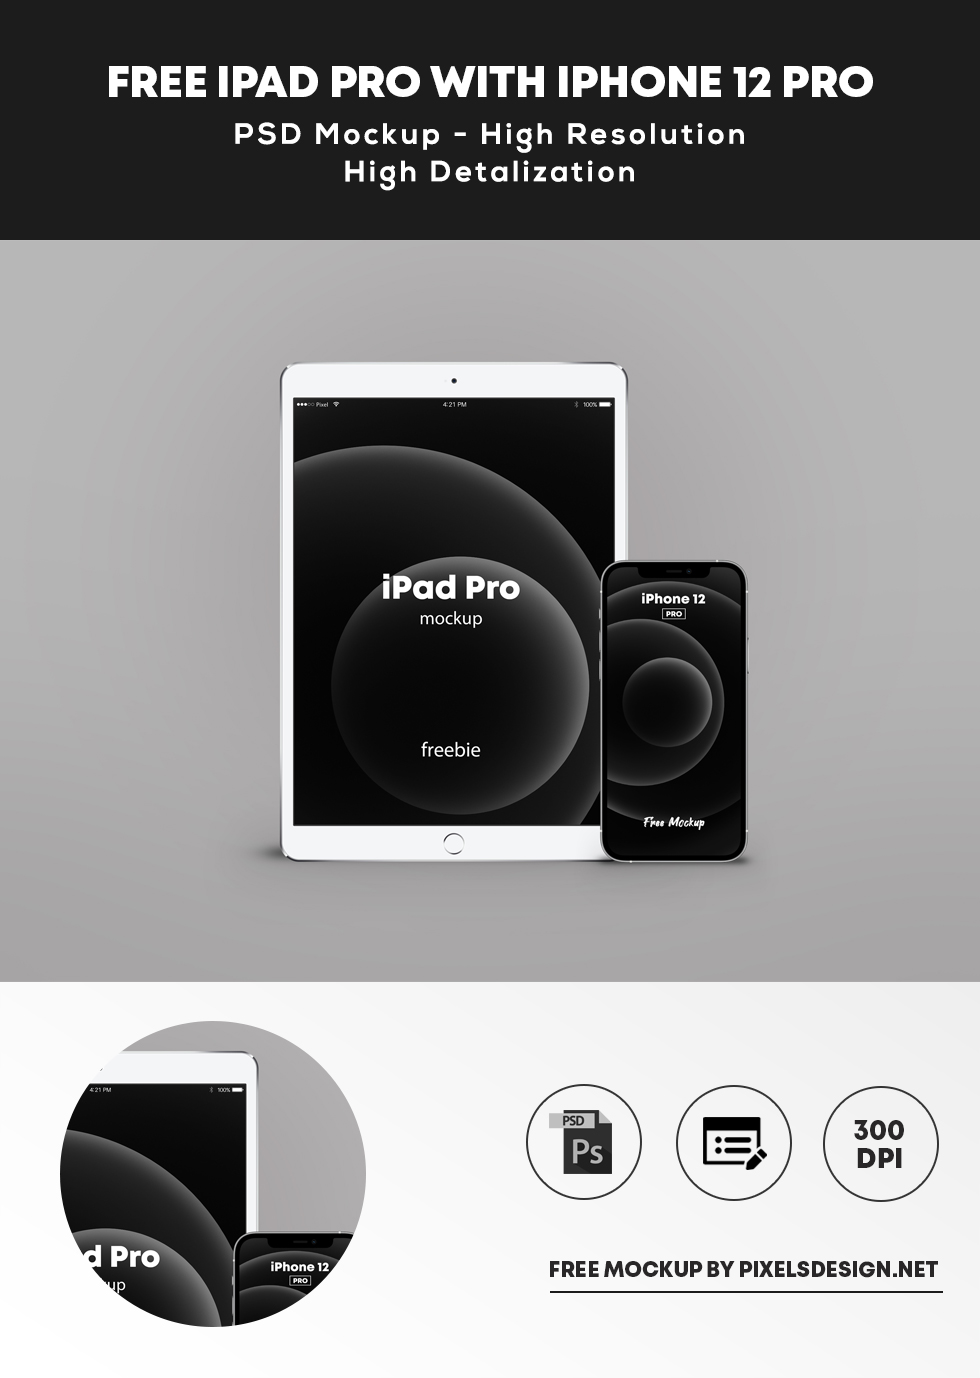 Free iPhone 12 Pro with iPad Pro Mockup